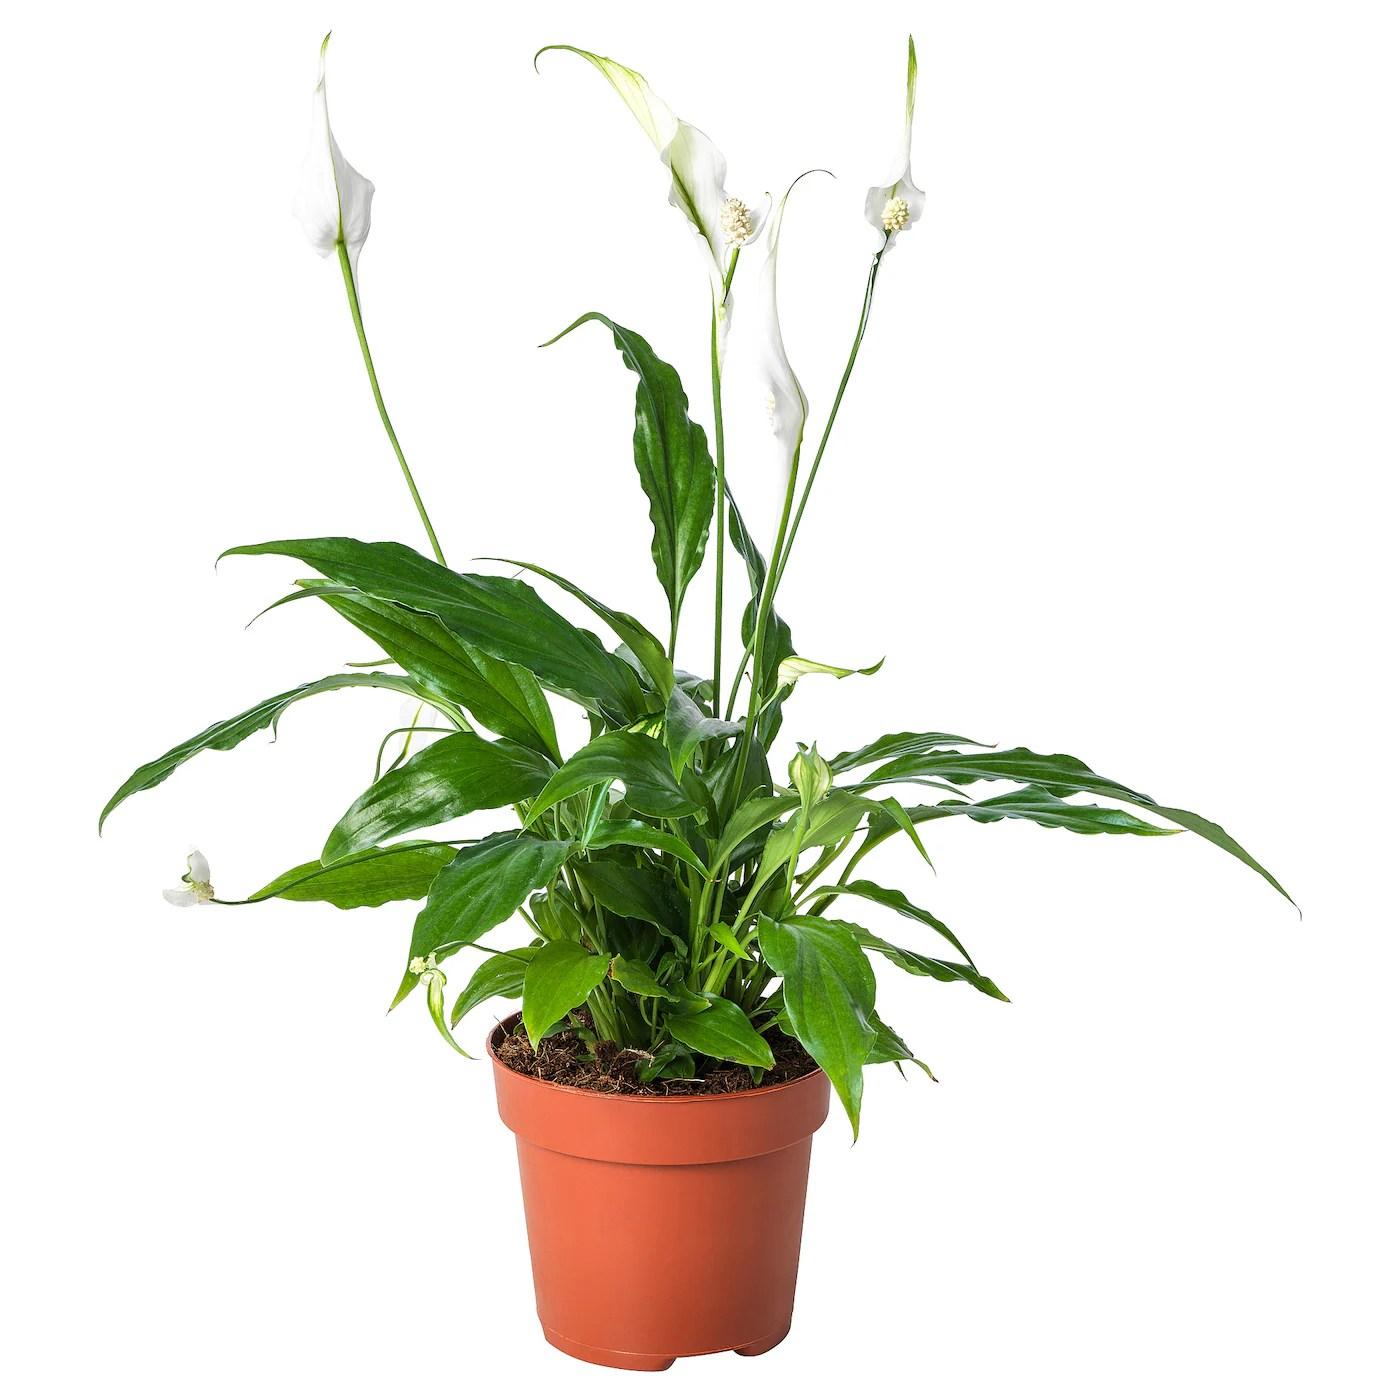 ikea suspension plante plante a suspendre sur chambre ikea beau meuble plante luxe. Black Bedroom Furniture Sets. Home Design Ideas